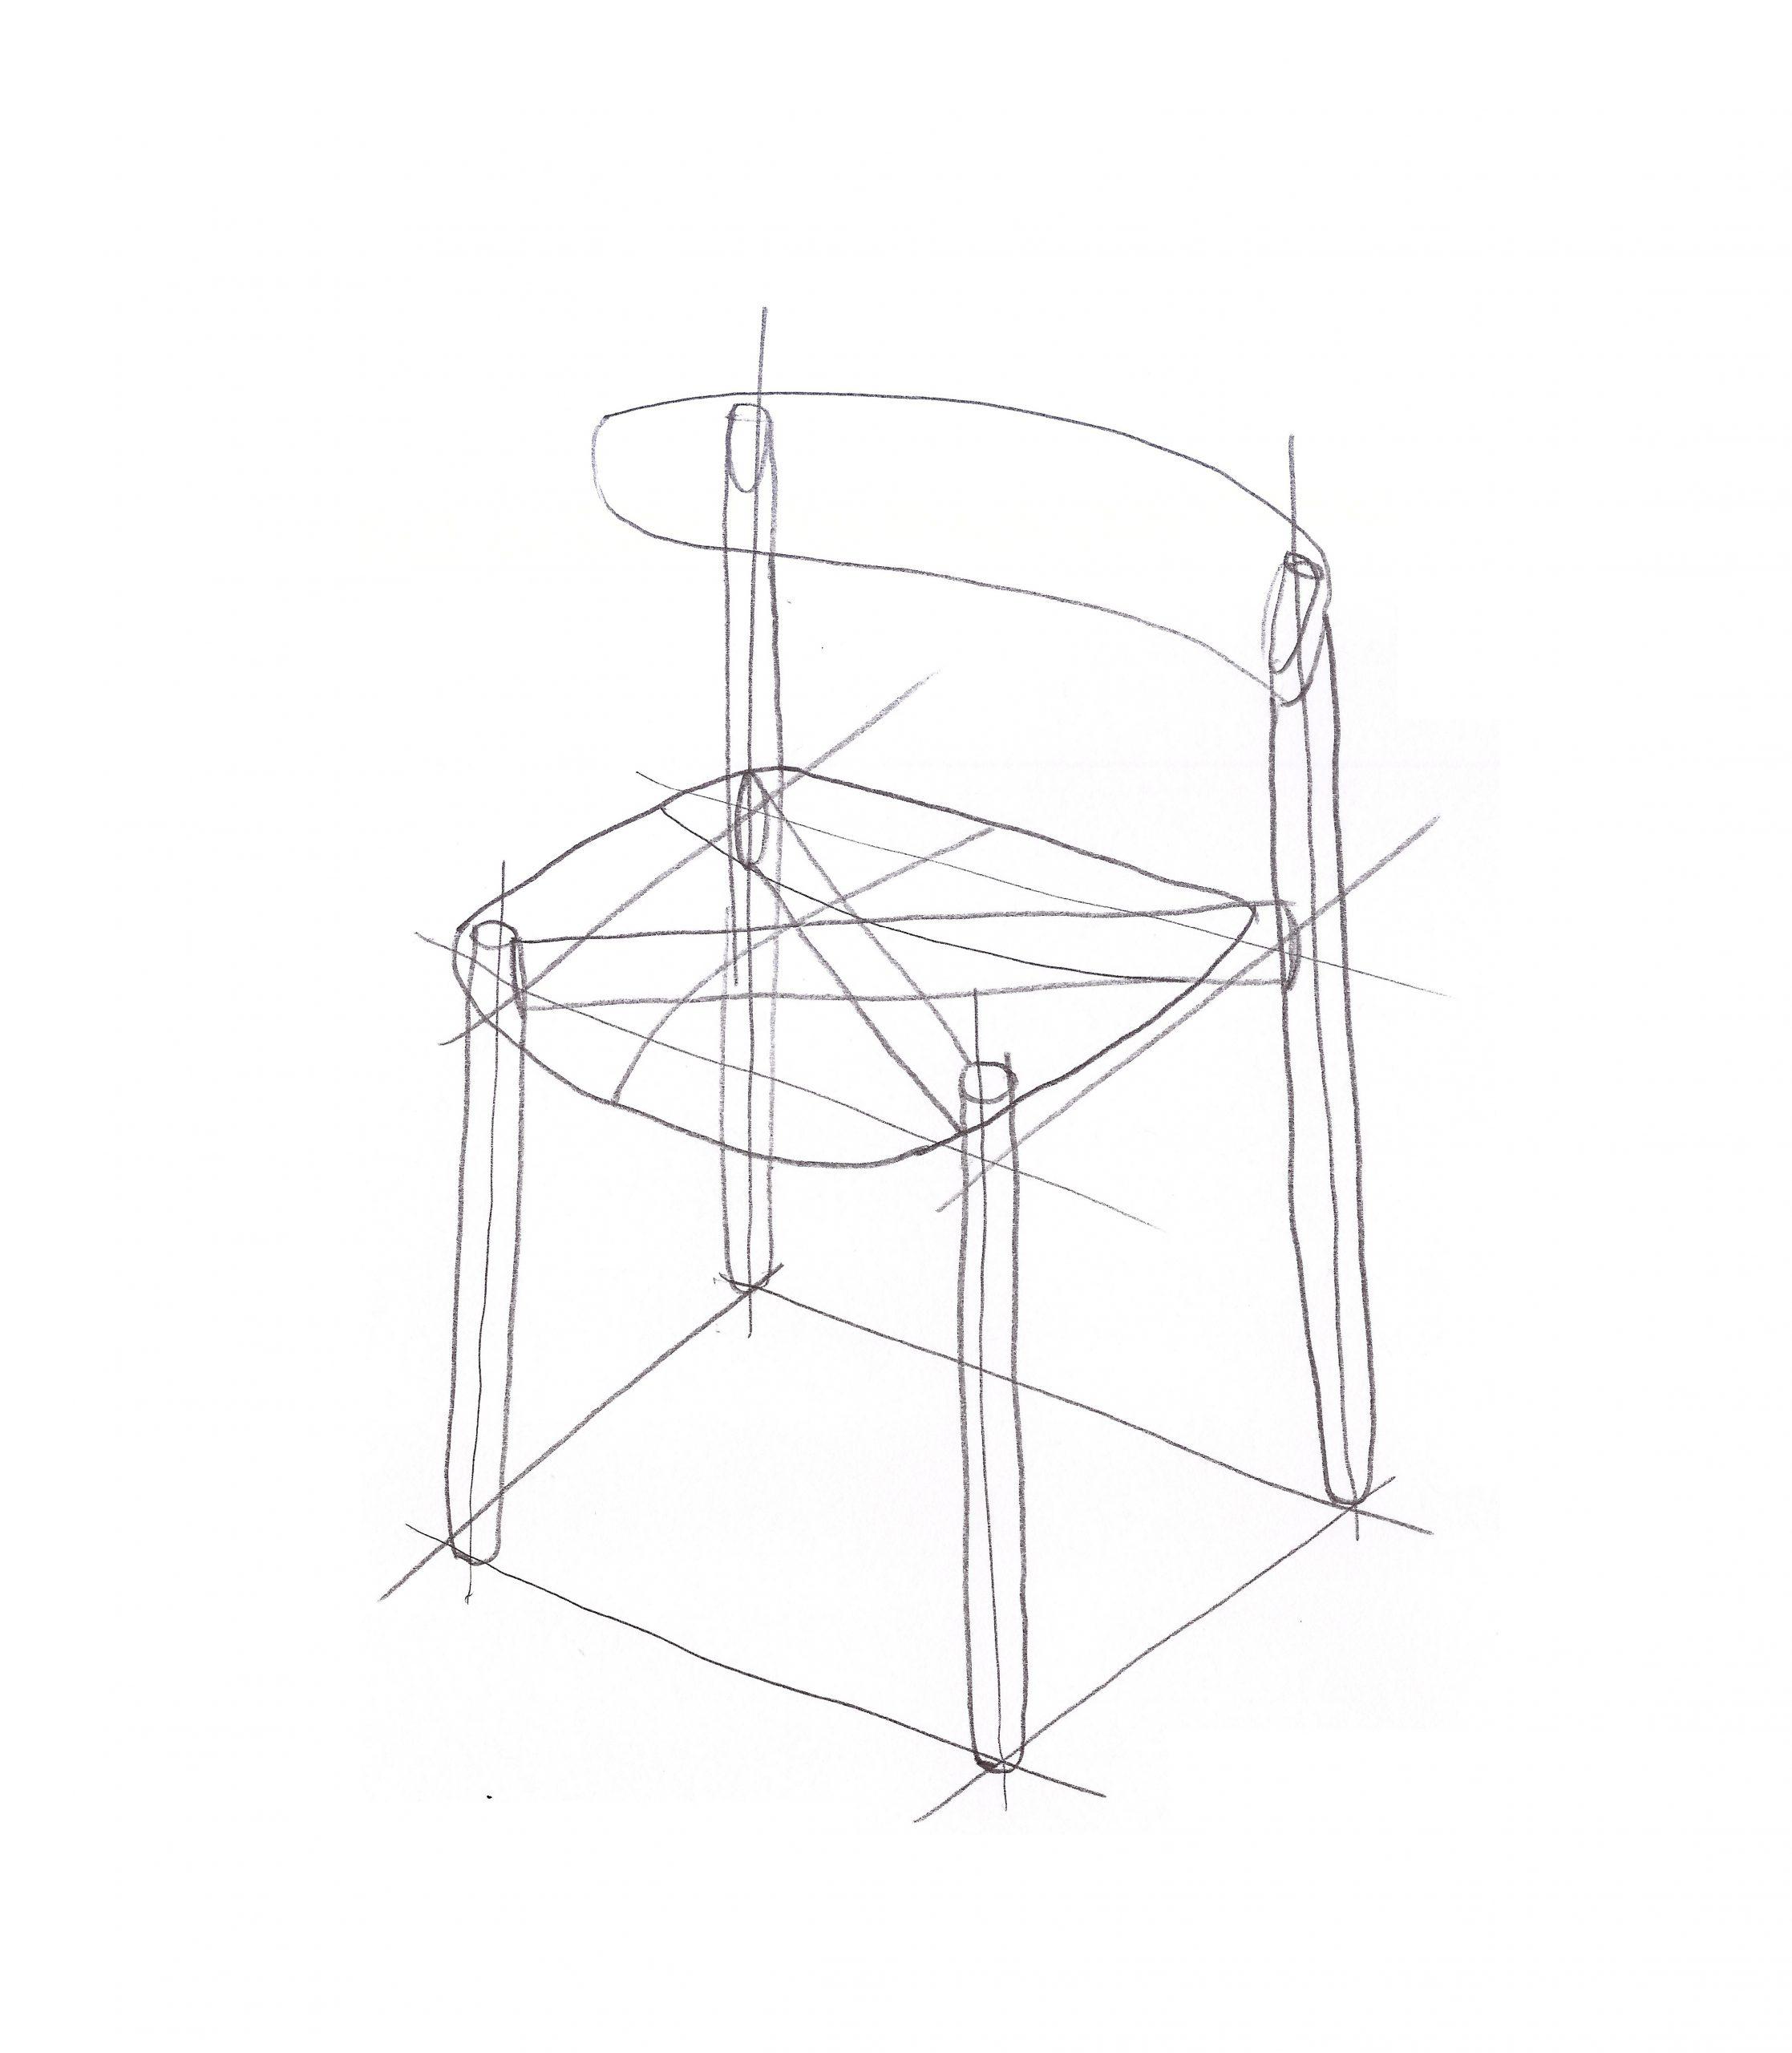 Sketch of the Bison chair by Debiasi Sandri for Tekhne